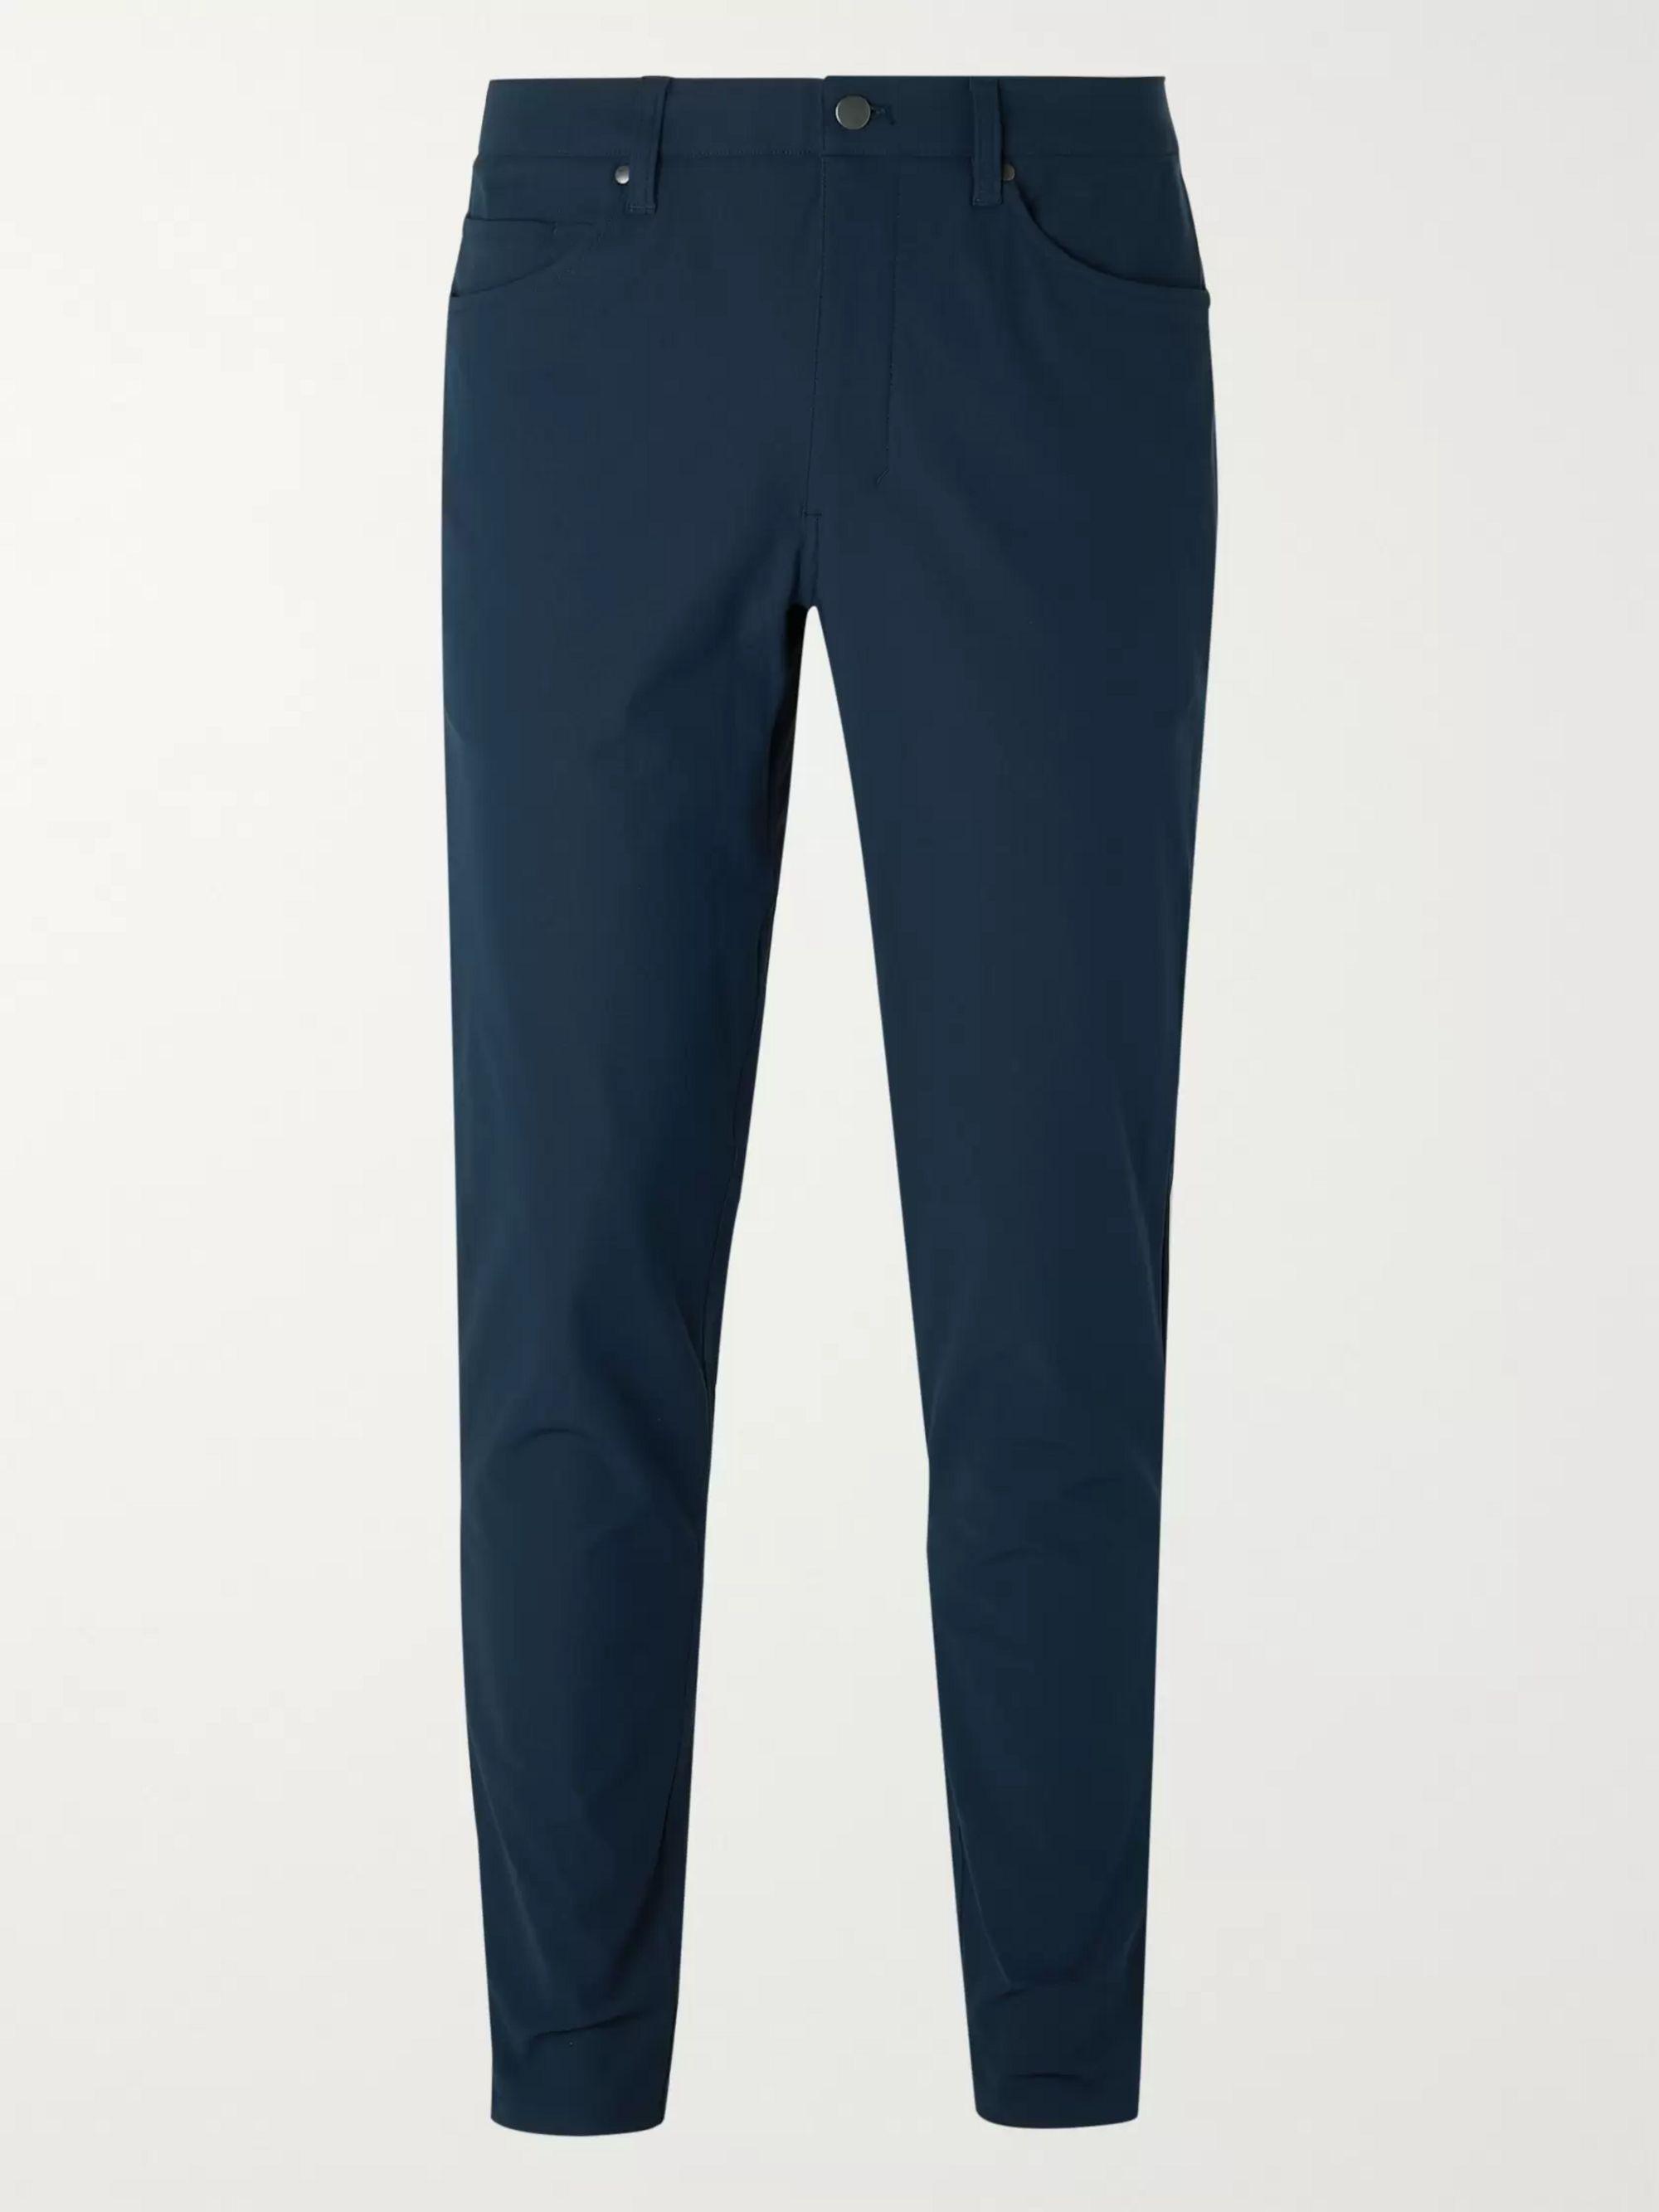 Lululemon ABC Slim-Fit Warpstreme Trousers